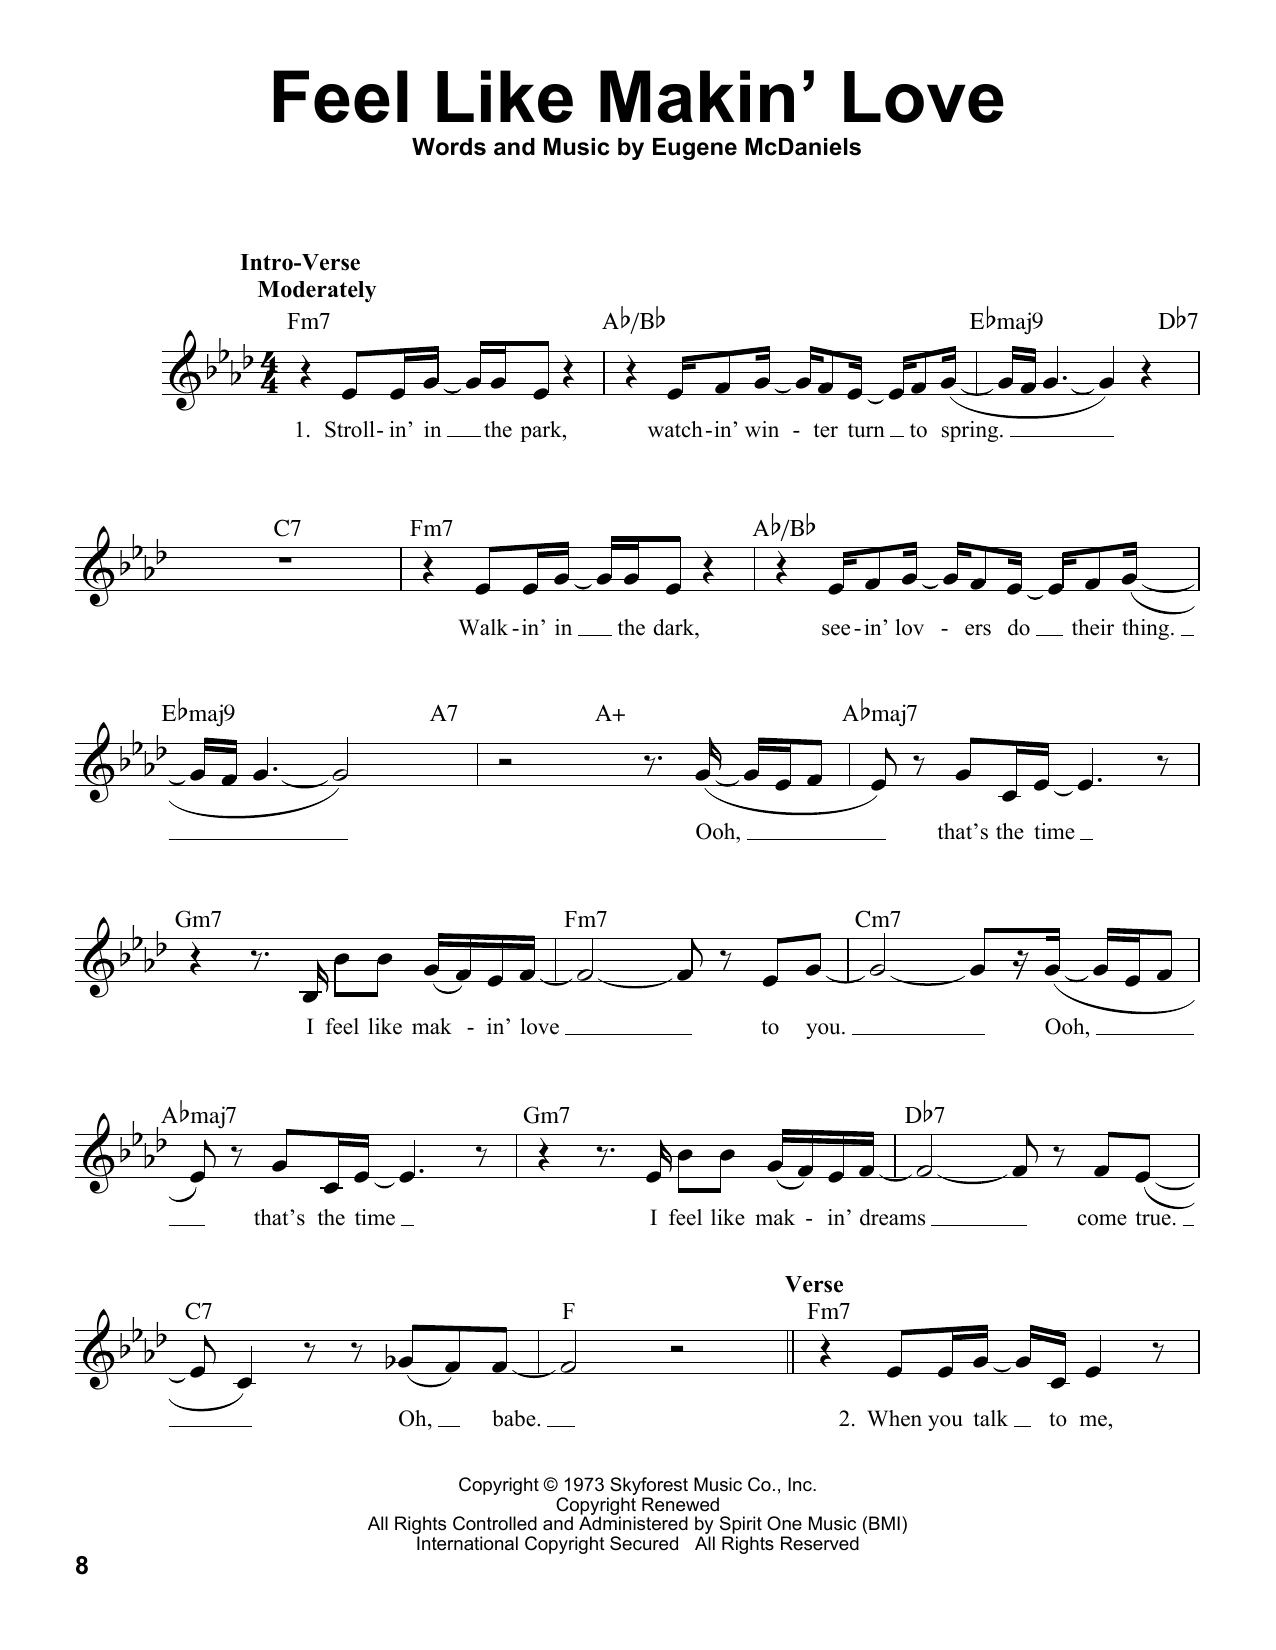 Feel Like Makin' Love (Pro Vocal)